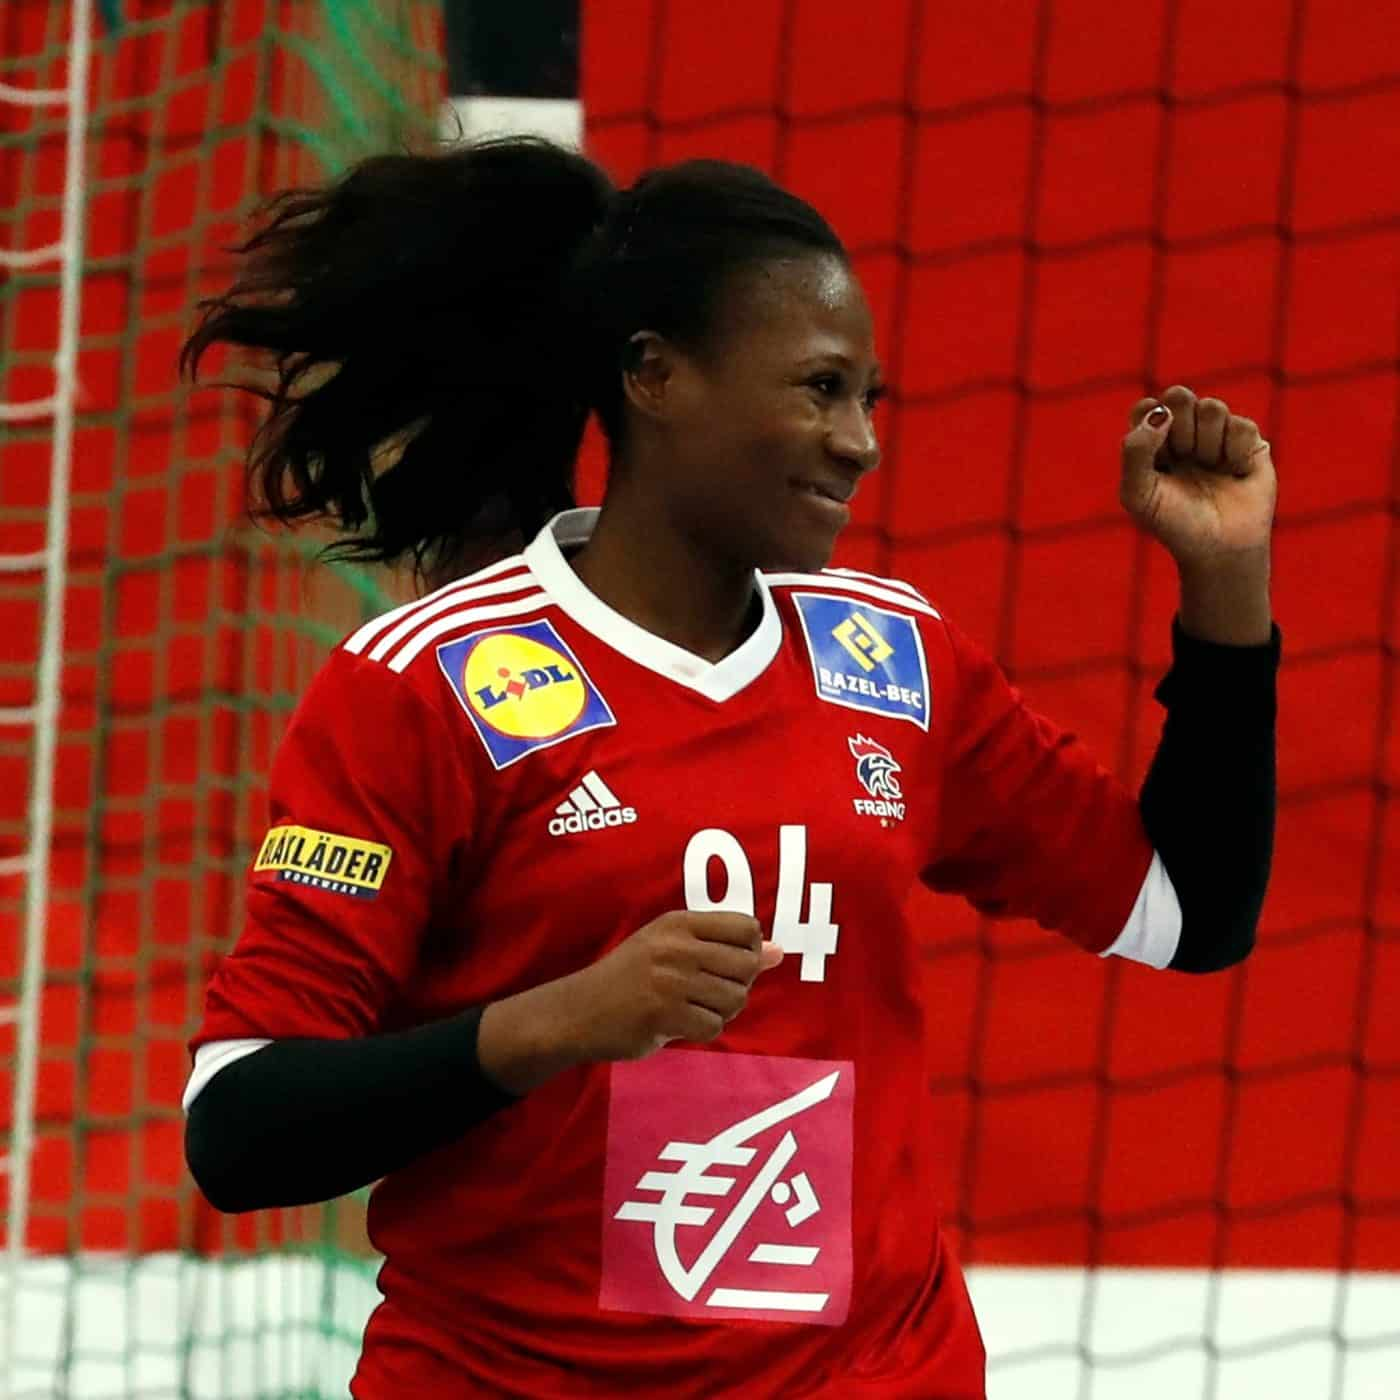 octobre-rose-équipe-de-france-handball-2019-caisse-d-epargne-3